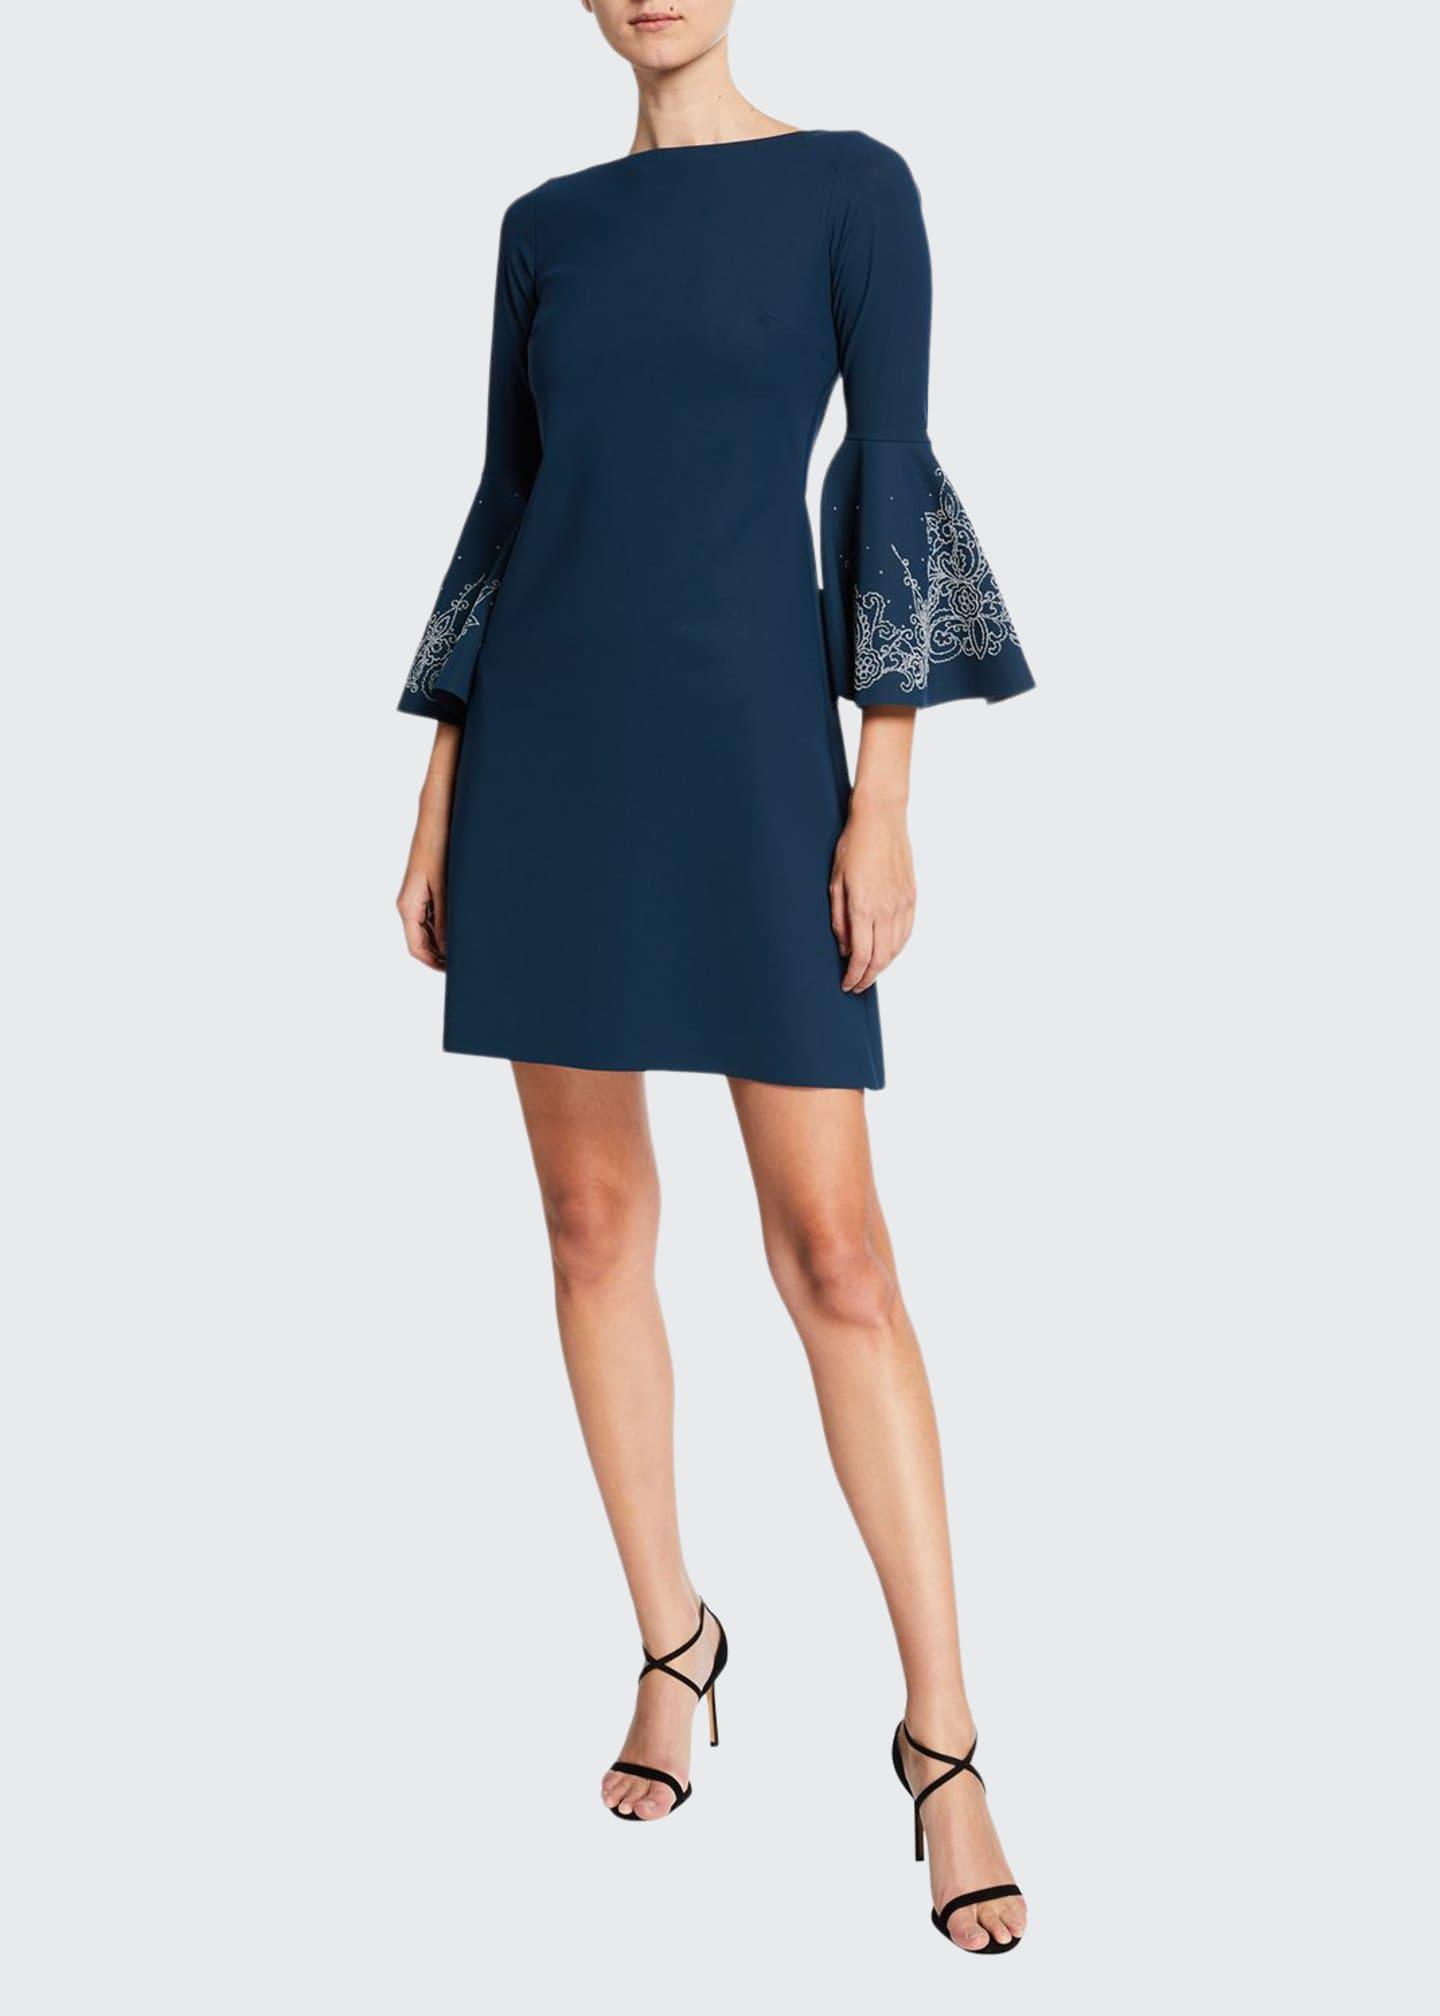 Chiara Boni La Petite Robe Natalia Bell-Sleeve Dress